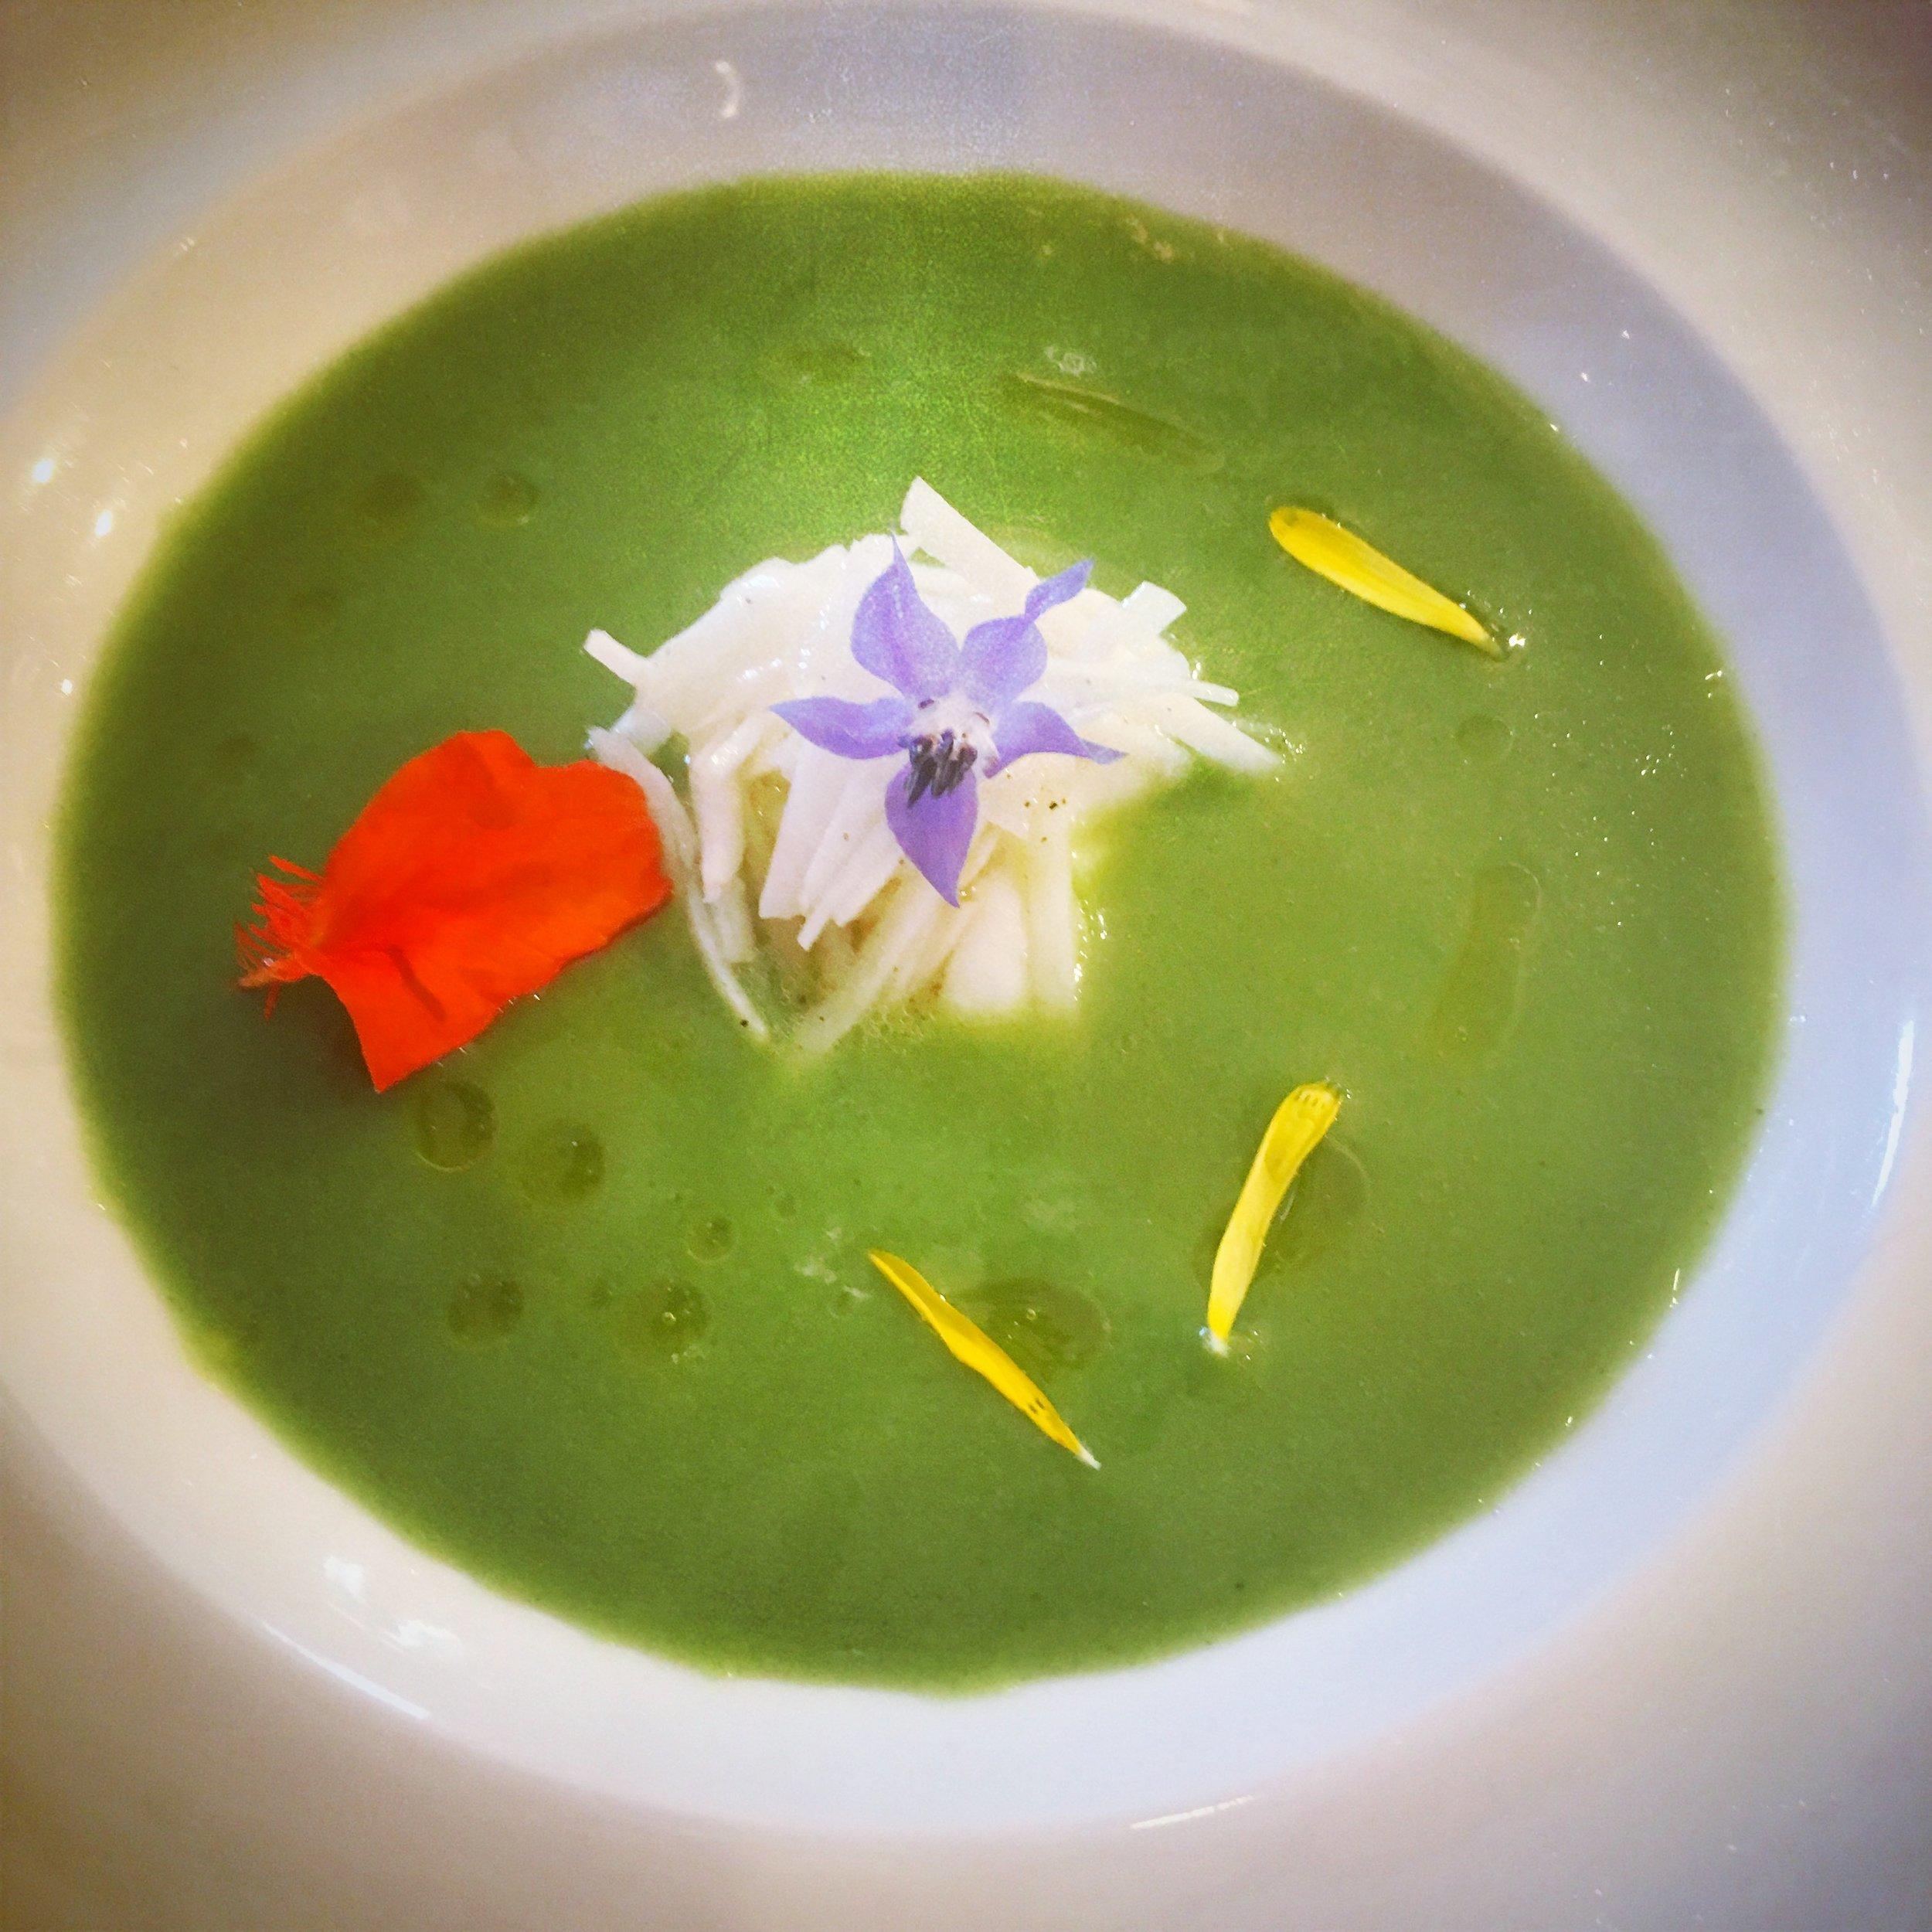 broccoli soup orchard kitchen chef vincent.JPG